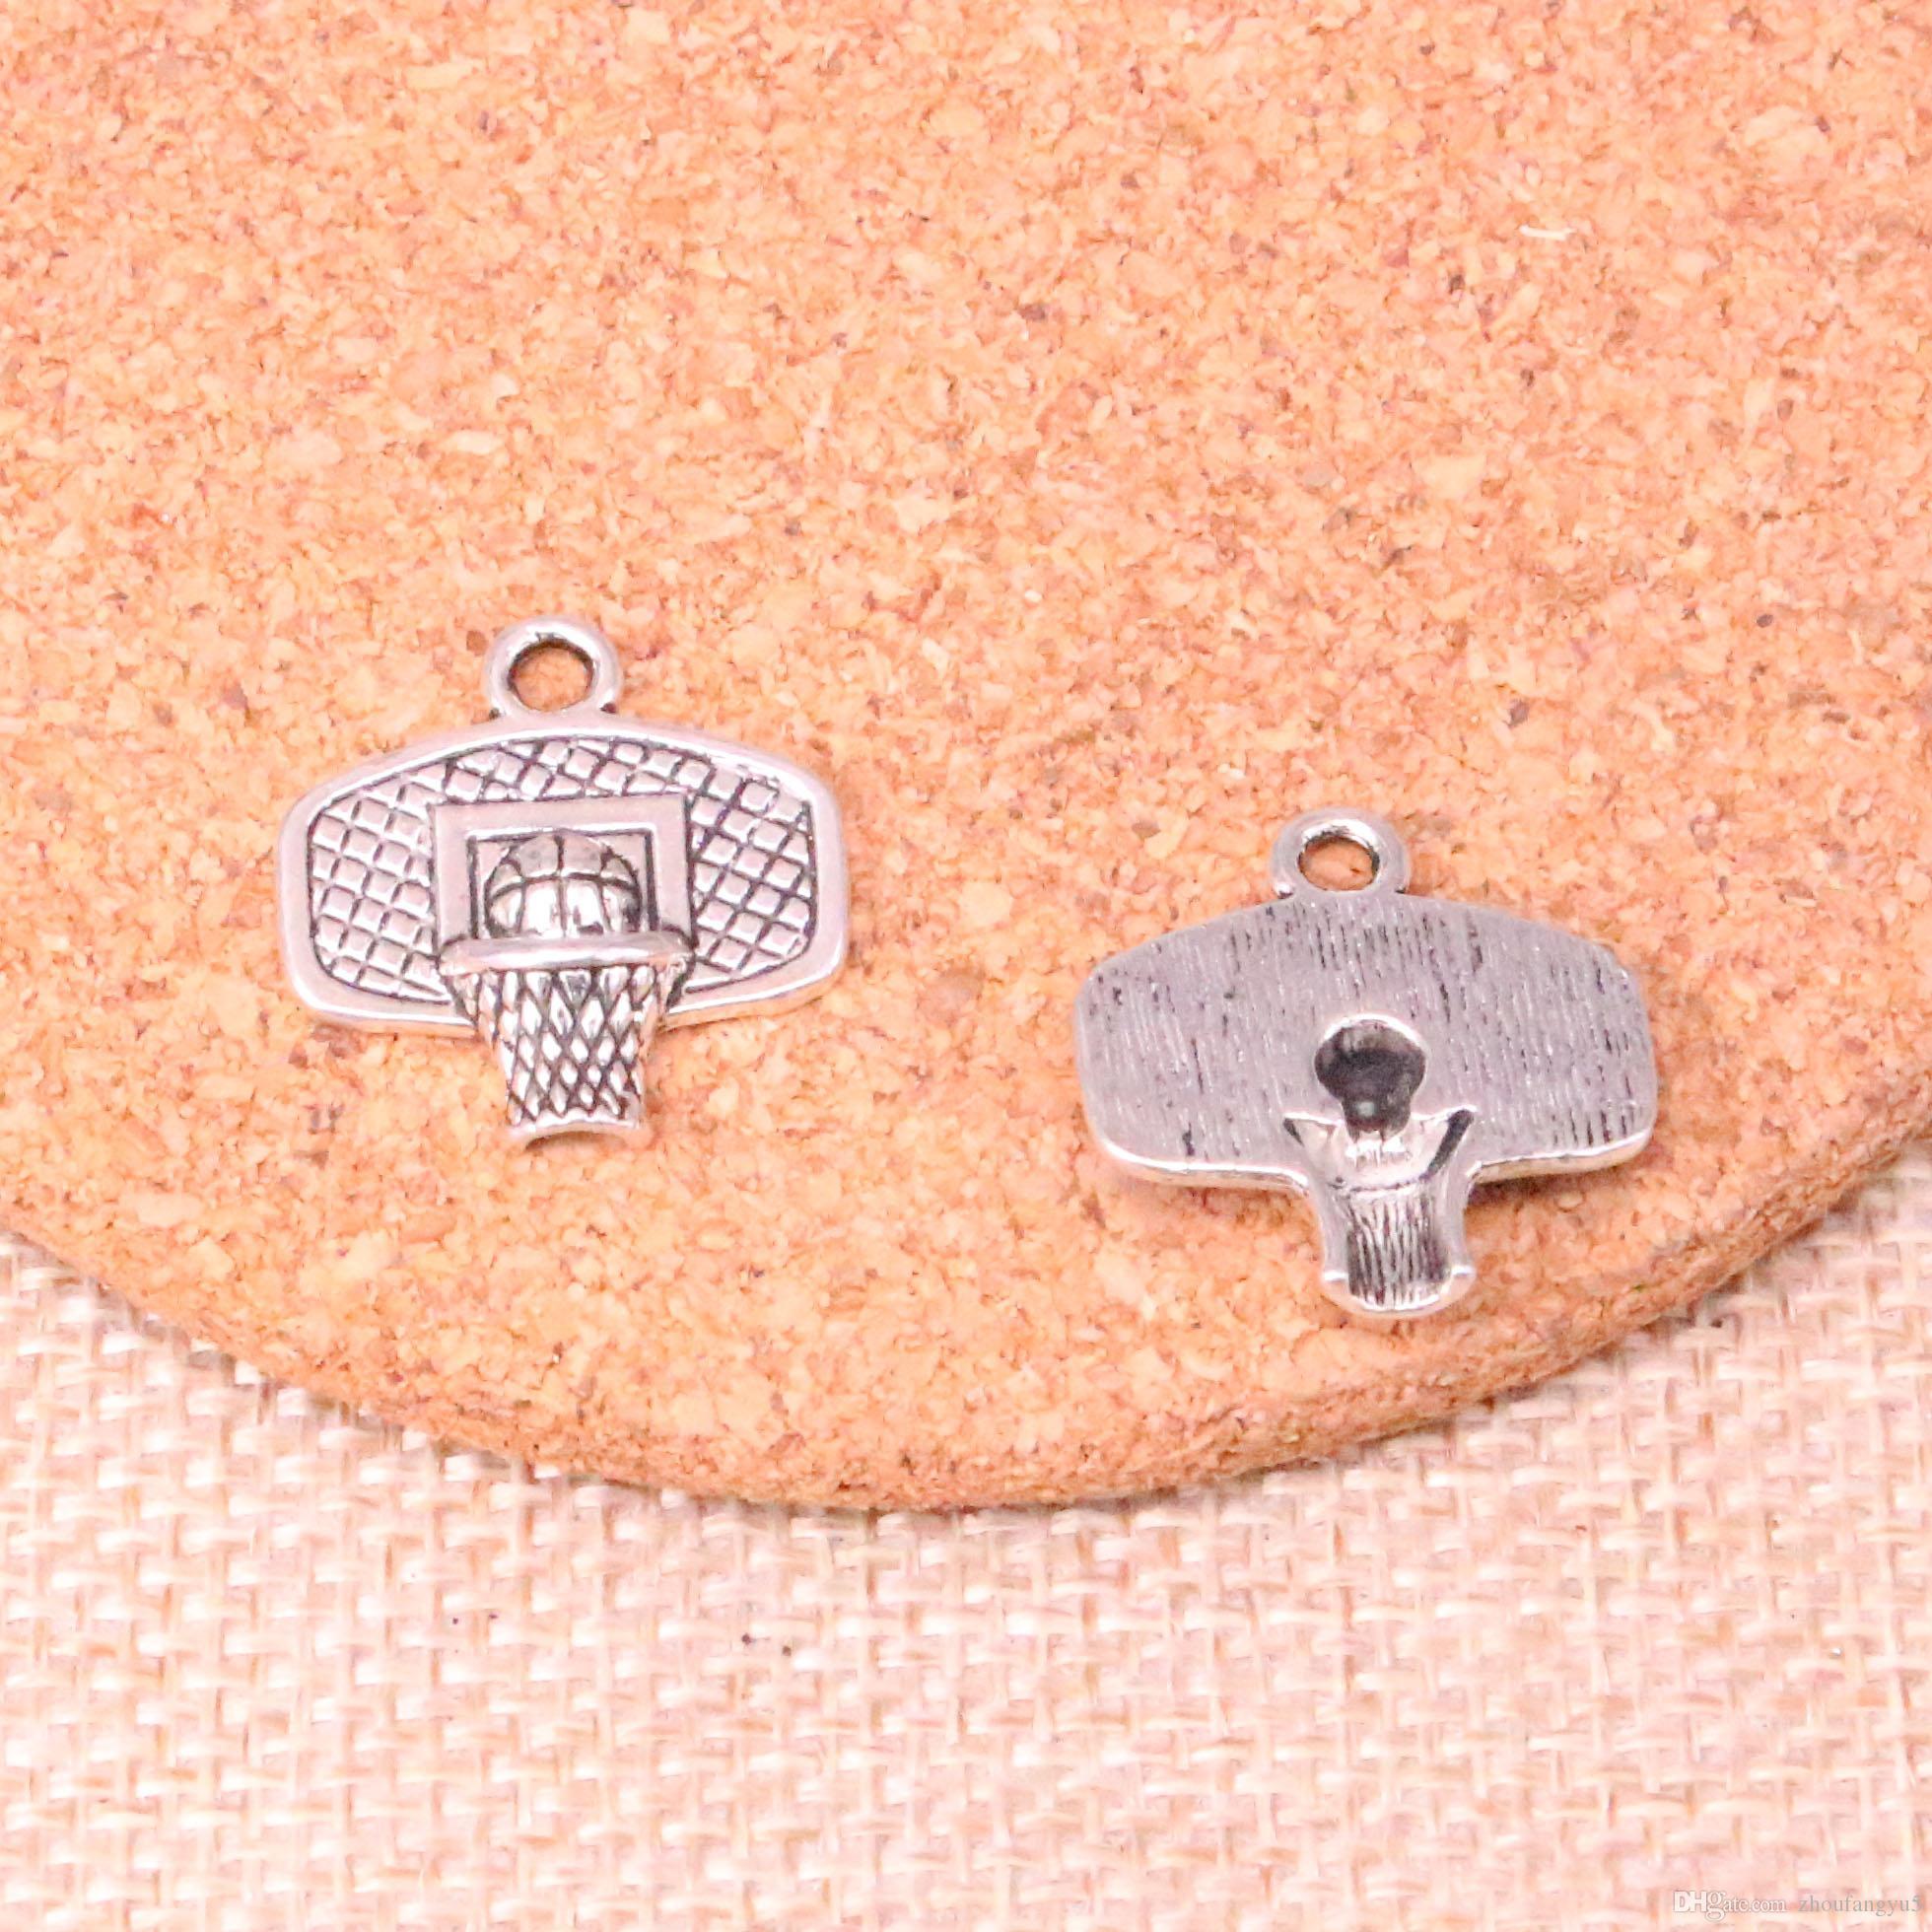 67pcs Charme Basketballkorb 20 * 19mm Antike, die Anhänger fit, Jahrgang Tibetischen Silber, DIY Handgemachter Schmuck